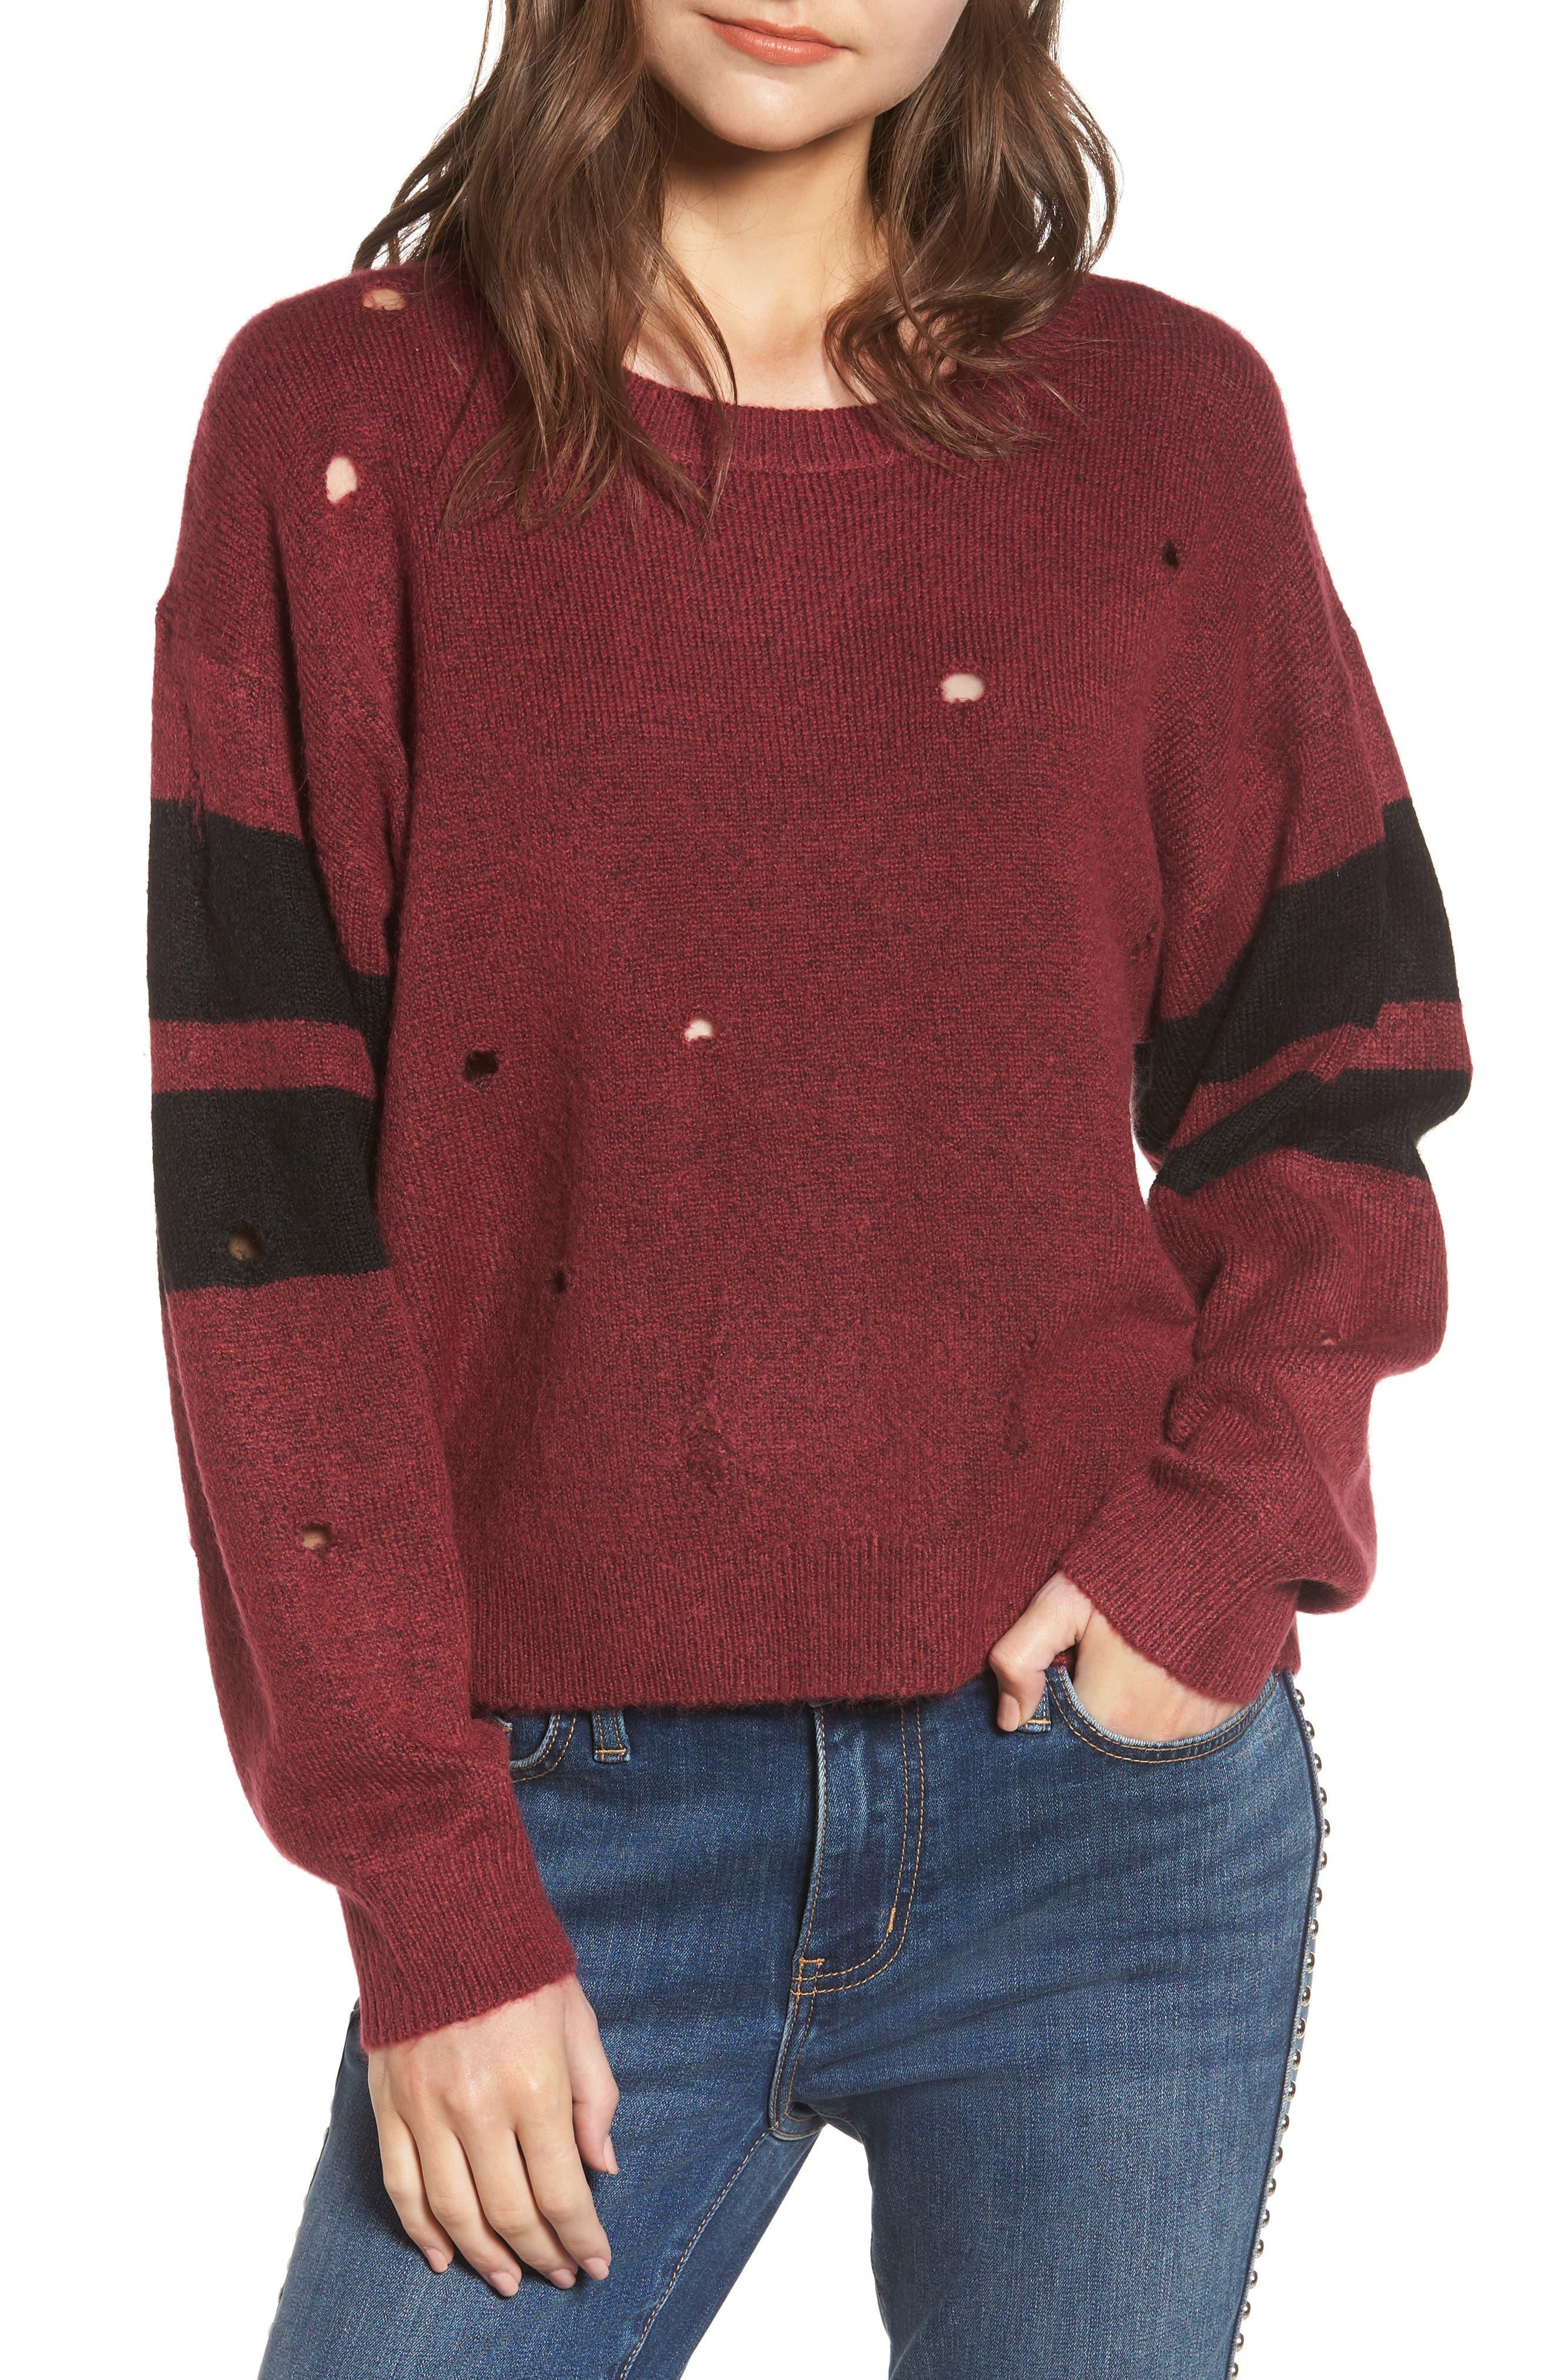 The Yates Sweater in Cordovan/ Black Stripes